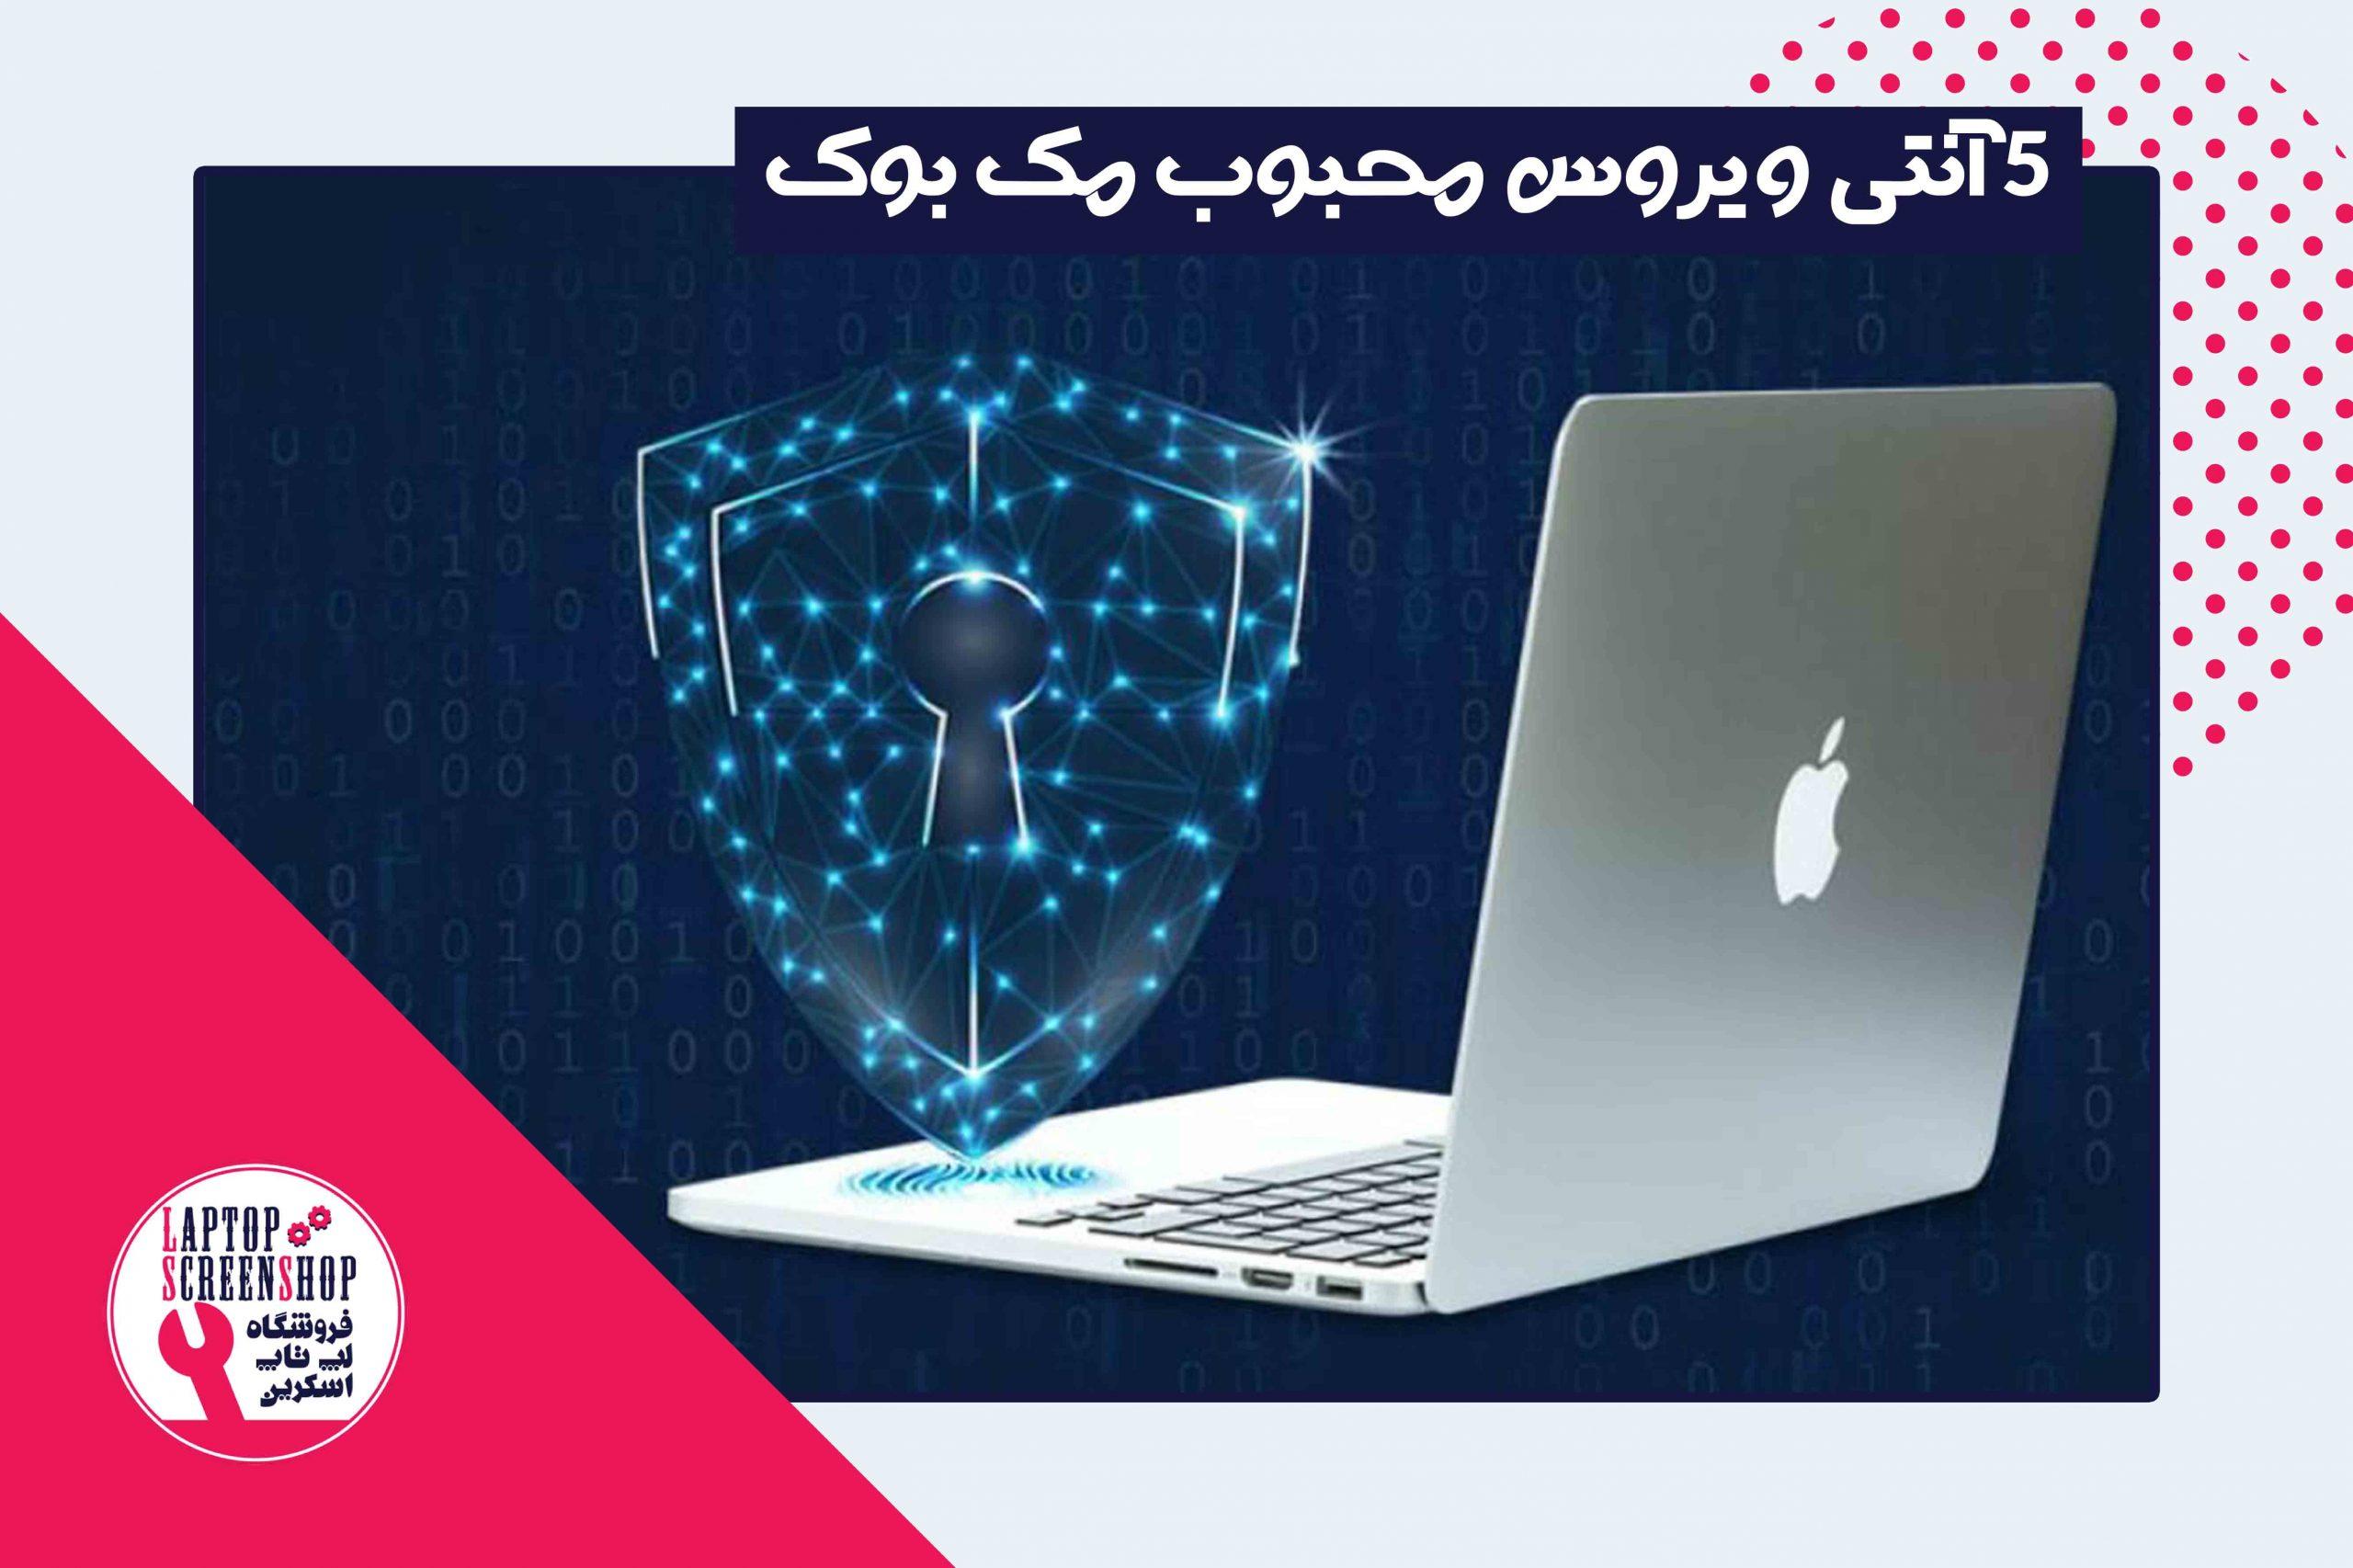 best antivirus for mac | تعمیرات لپ تاپ| لپ تاپ اسکرین| ال سی دی| خرید اینترنتی ال سی دی لپ تاپ